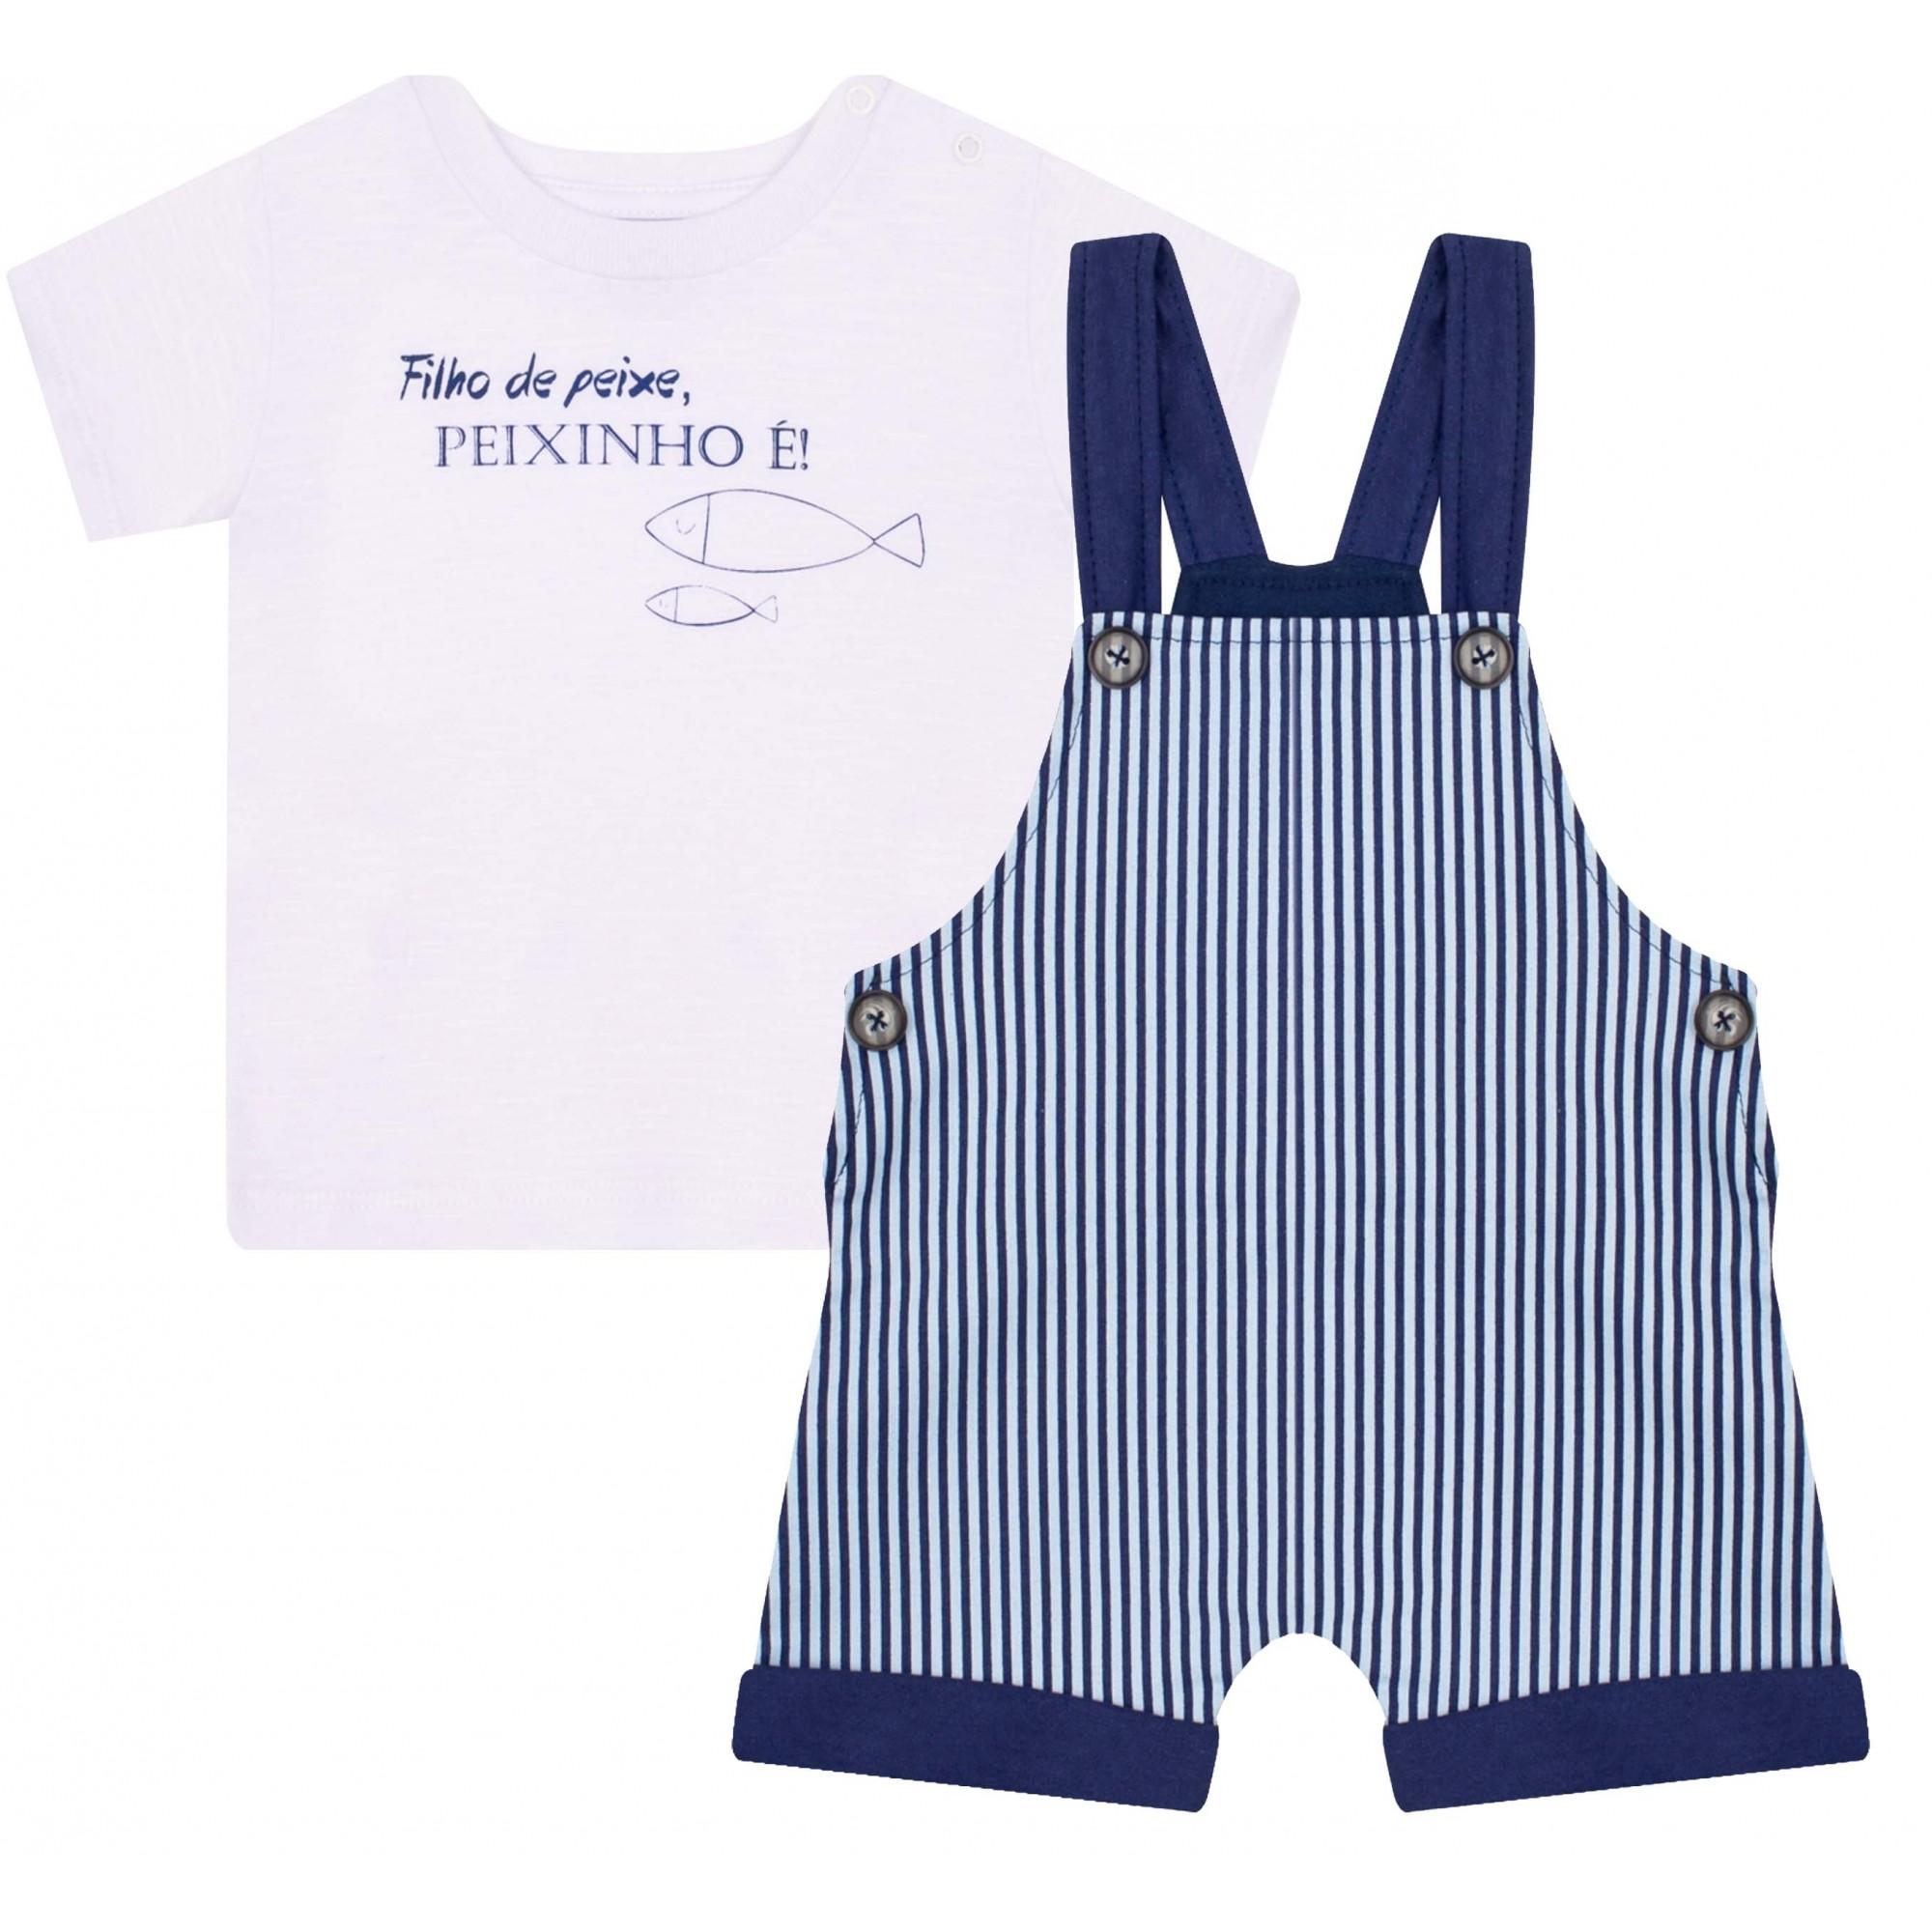 Jardineira e Camiseta Peixinho Marinho Junkes Baby